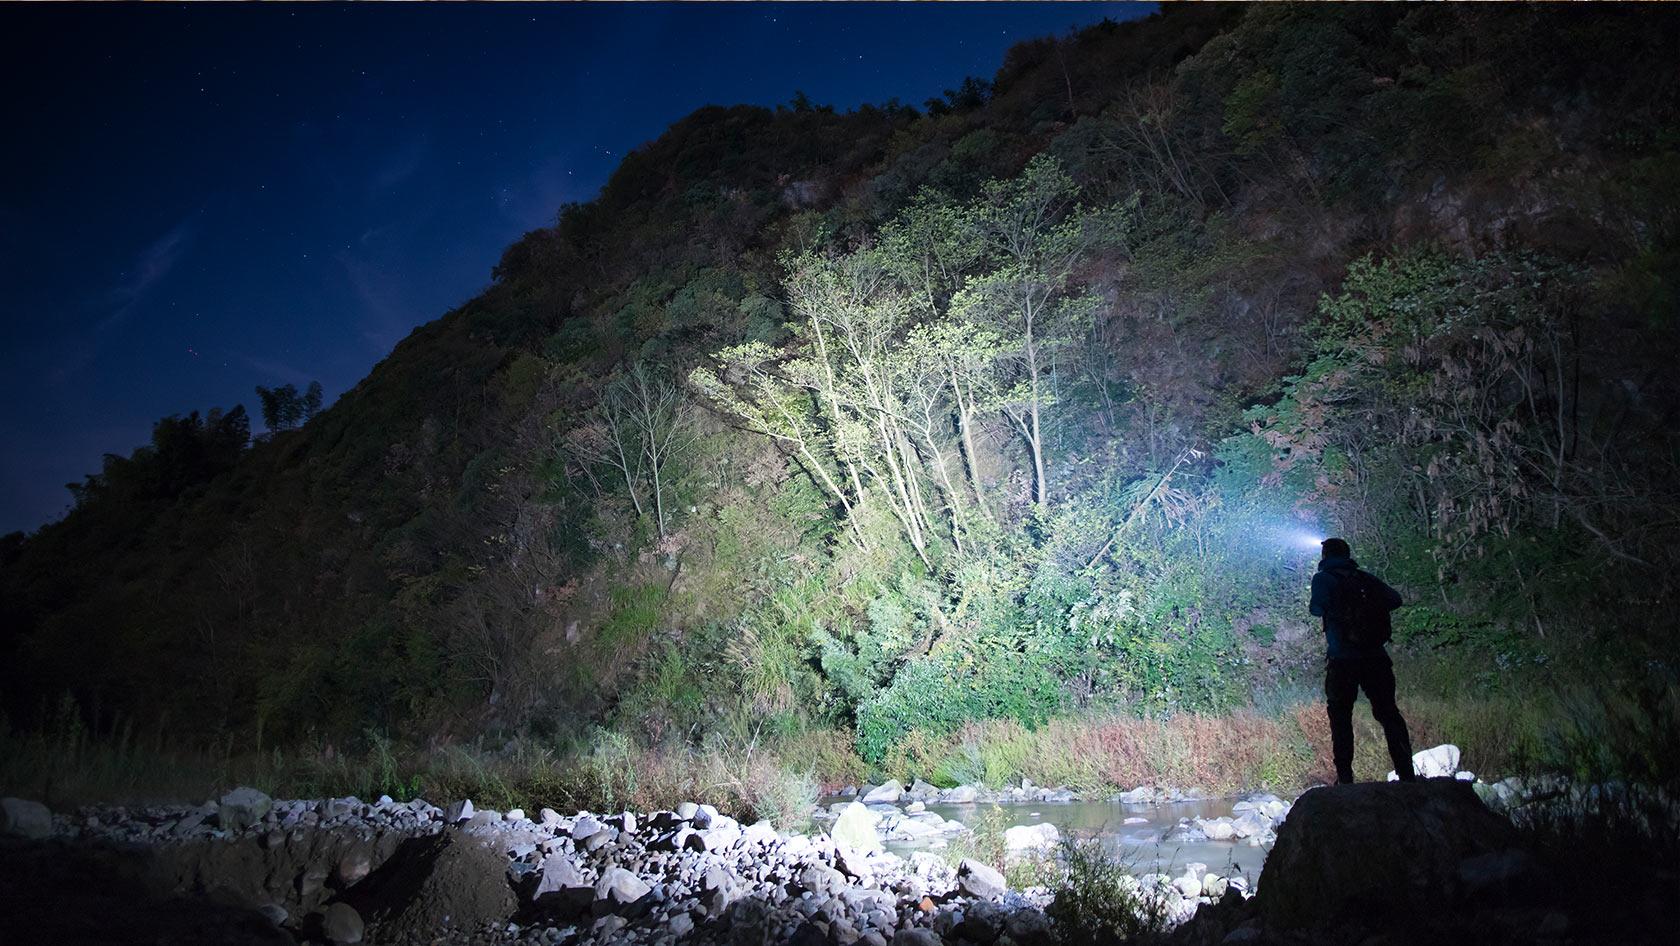 Perun lampe frontale 2000 lumens